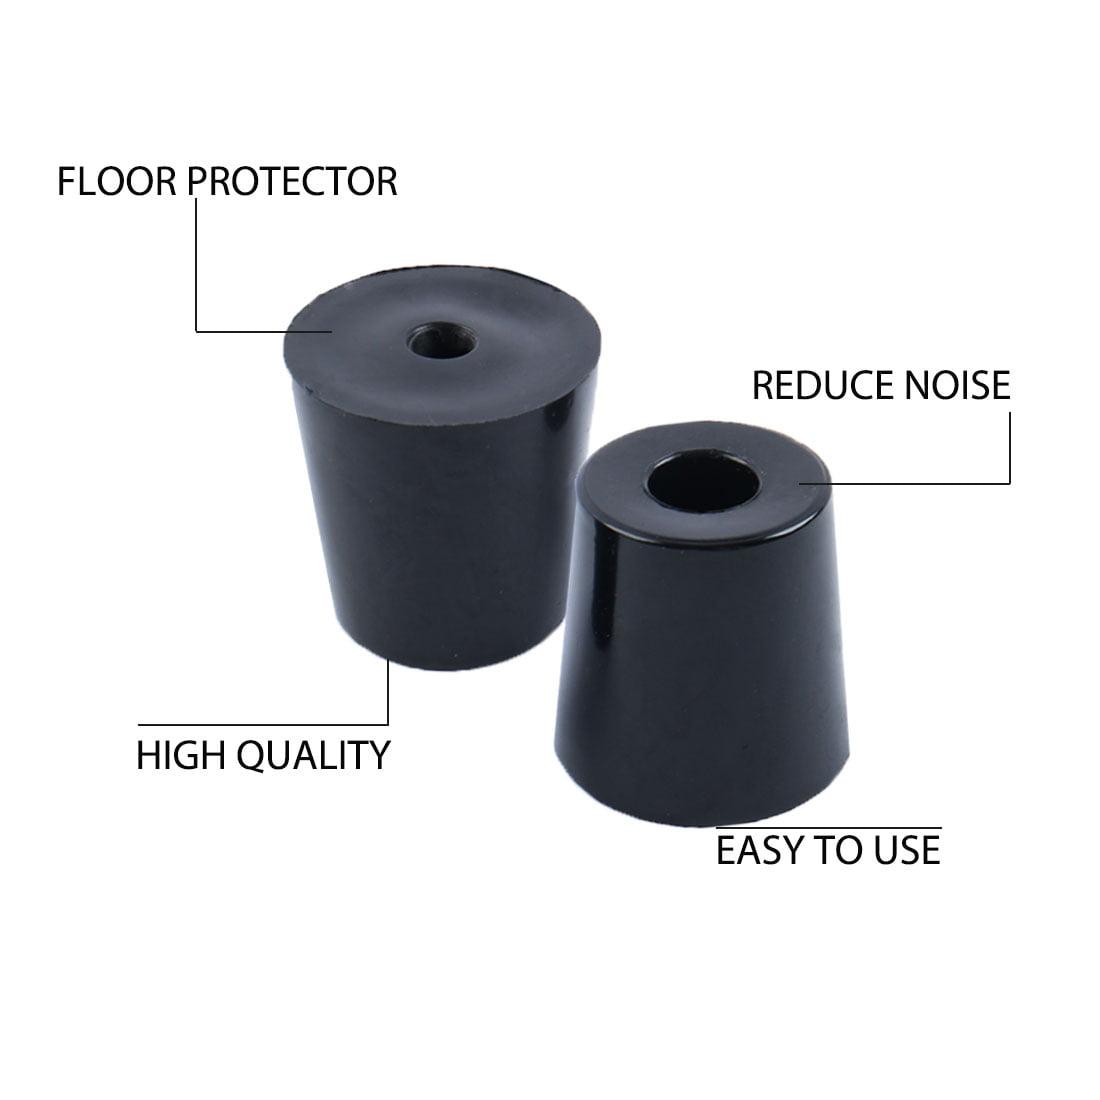 14pcs Rubber Feet Bumper Furniture Table Leg Pads Floor Protector, D35x27x25mm - image 6 of 7